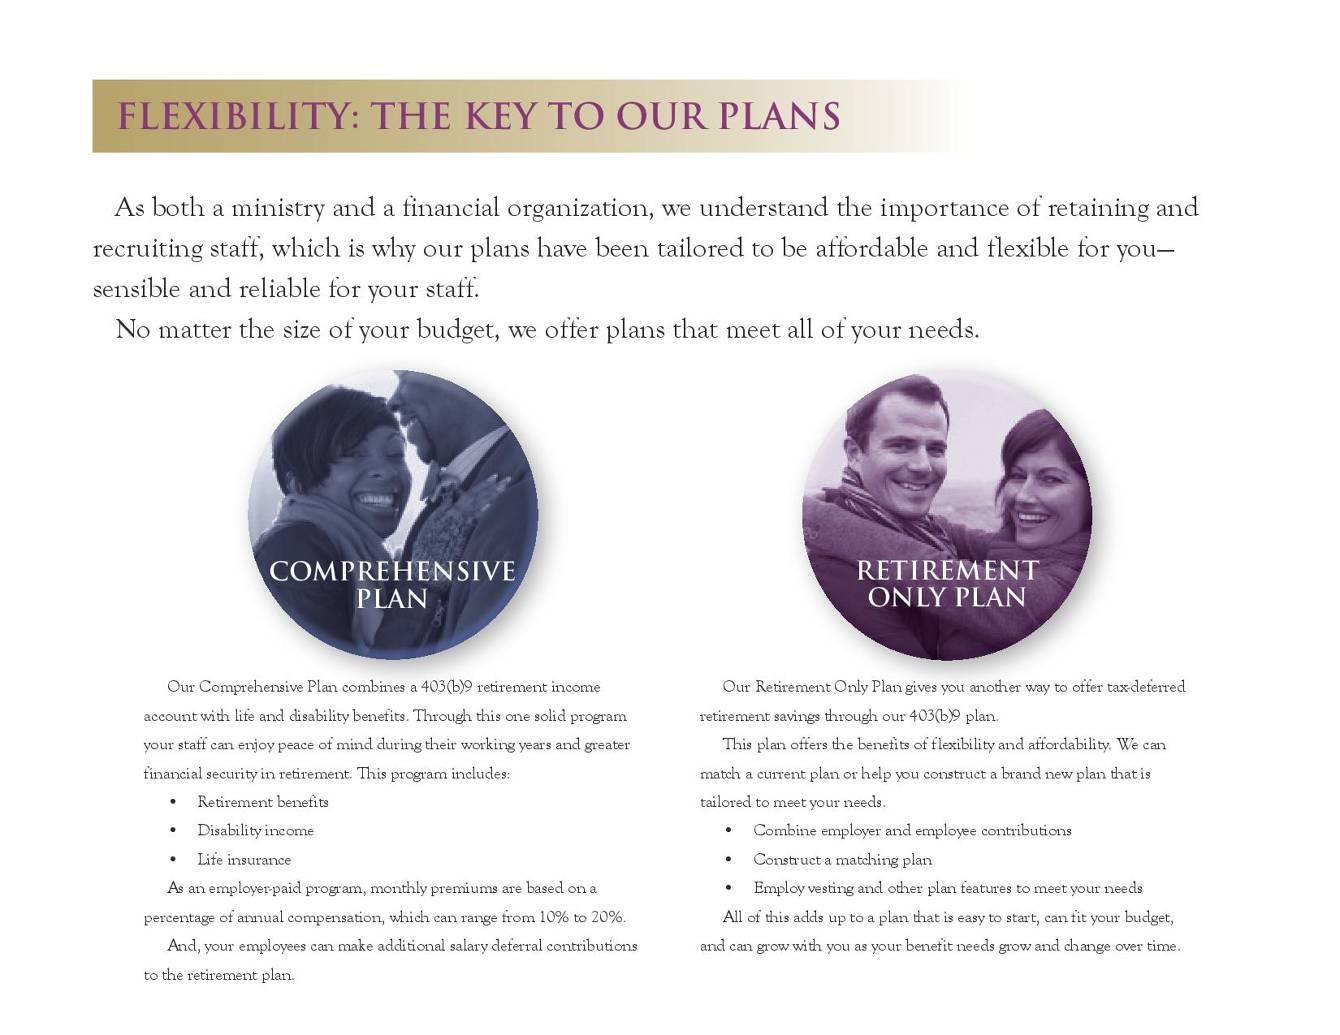 MMBB-Executive-Brochure-page-5_2x.jpg